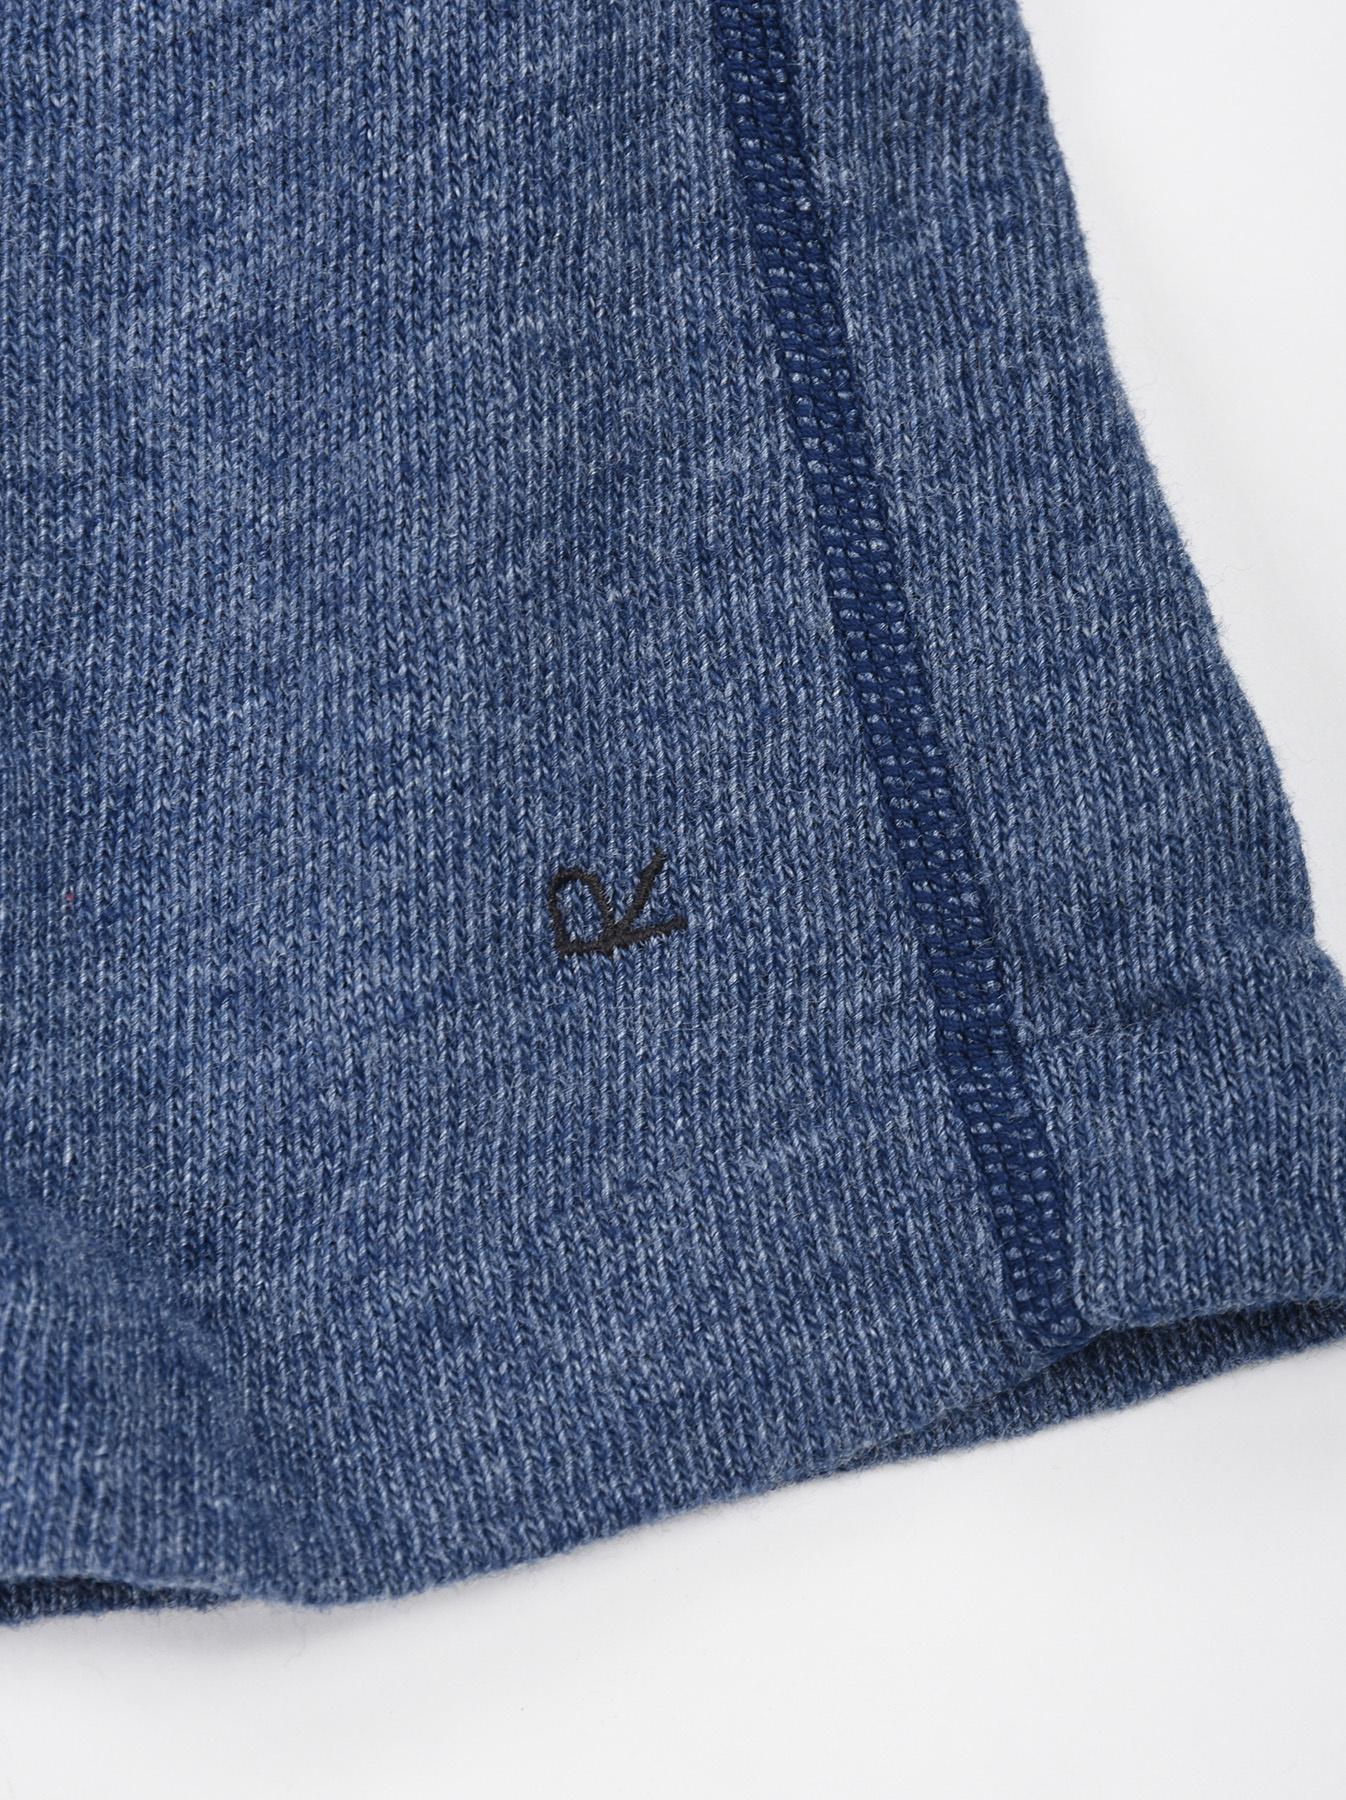 Low-gauge Tenjiku Long-sleeved Henley-12